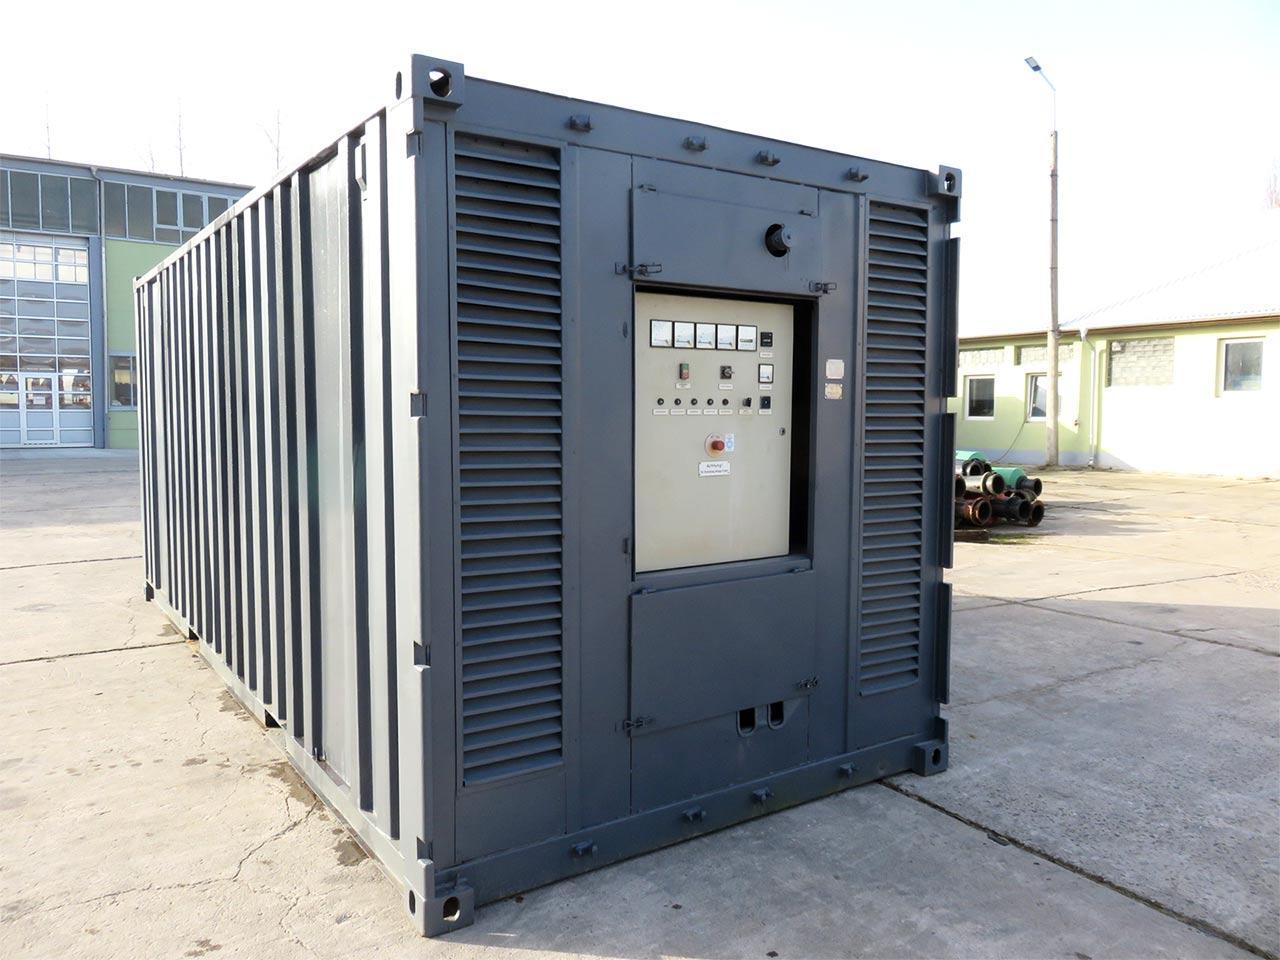 Generator Fimag 250 DCG VEM